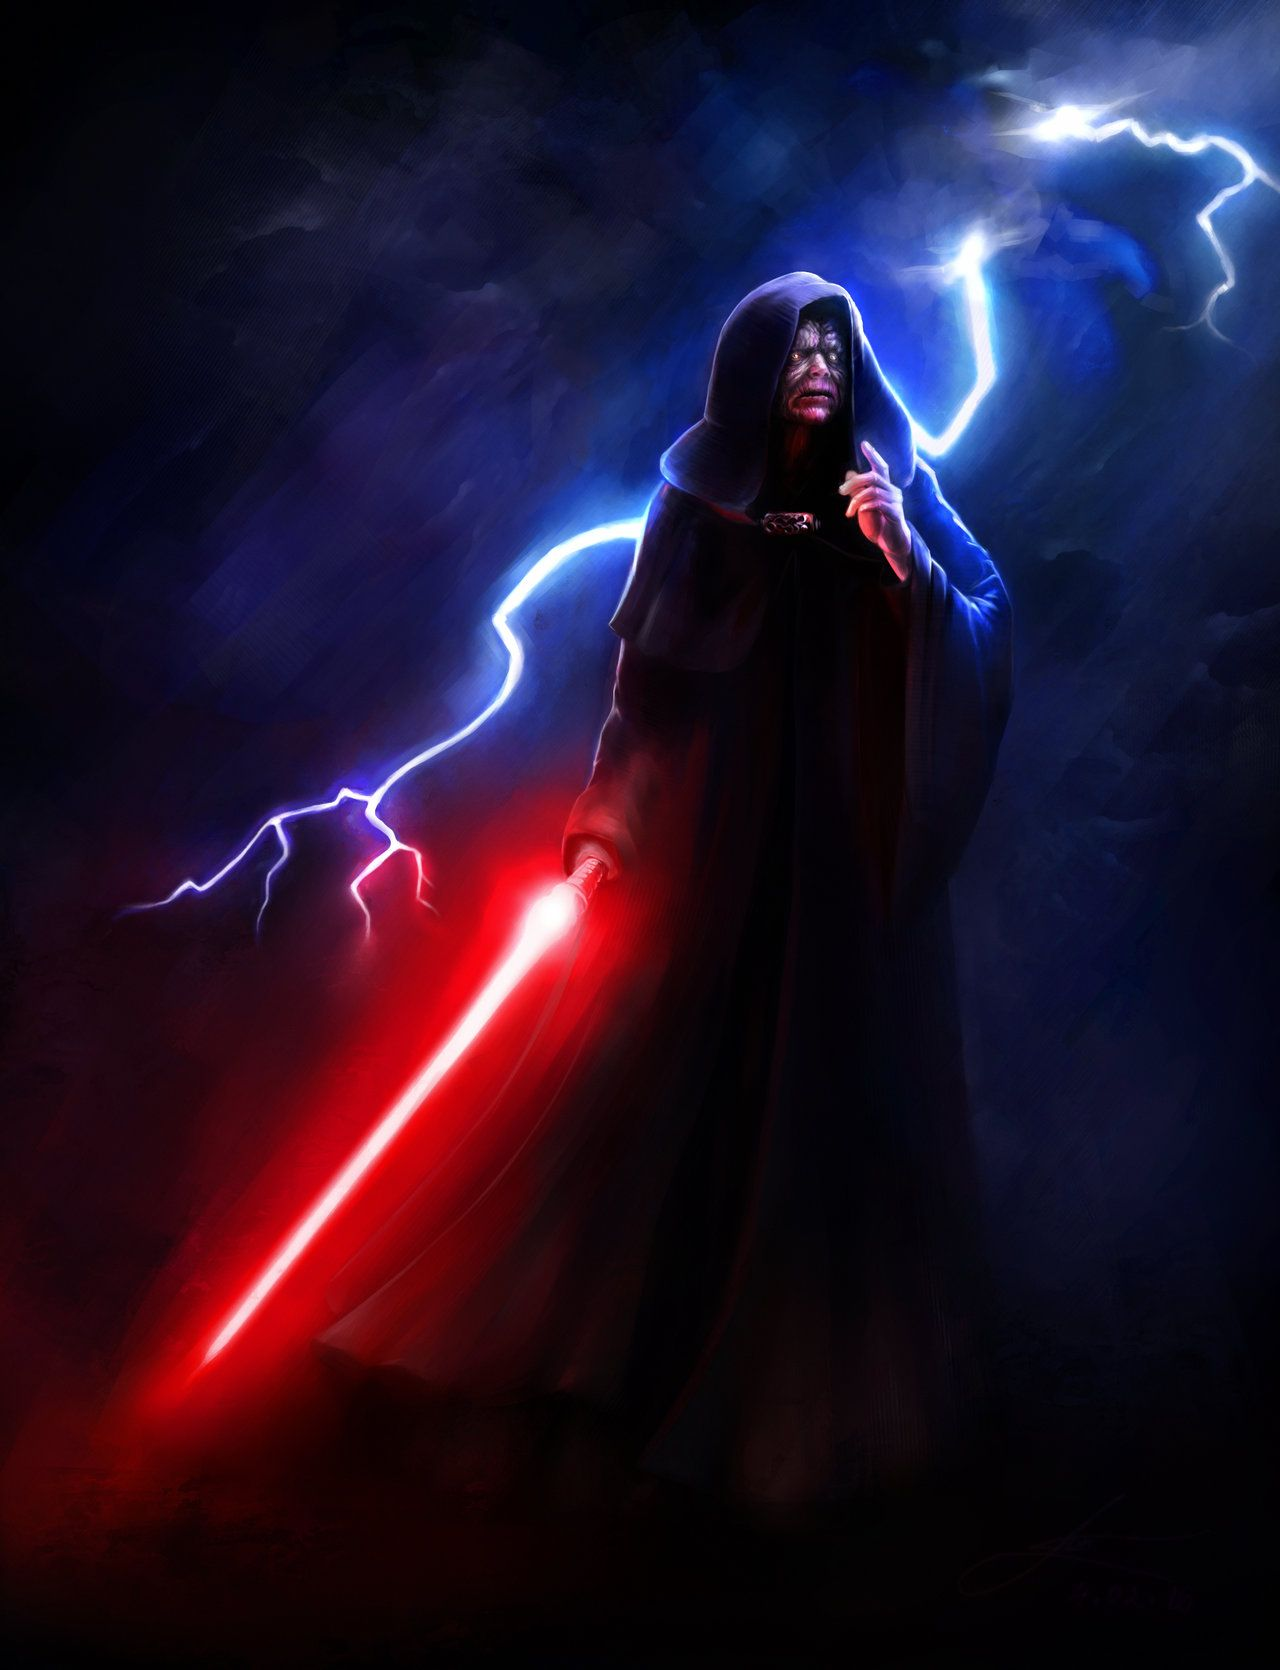 Klaatu Barada Nikto Dark Side Star Wars Star Wars Images Star Wars Empire